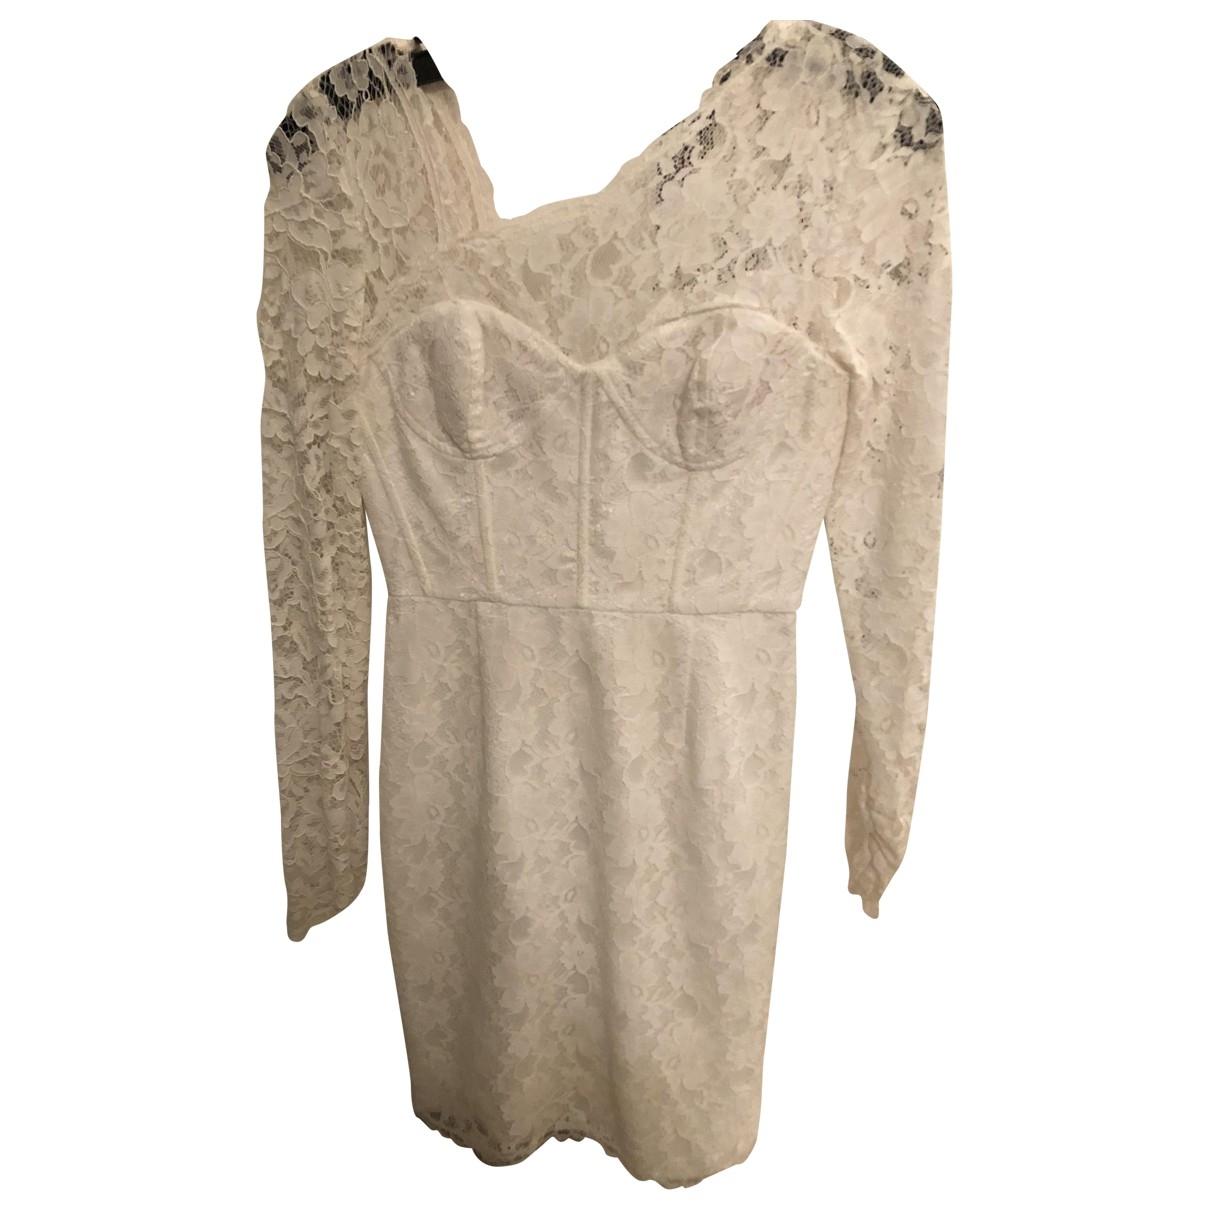 Bcbg Max Azria \N White Lace dress for Women 36 FR